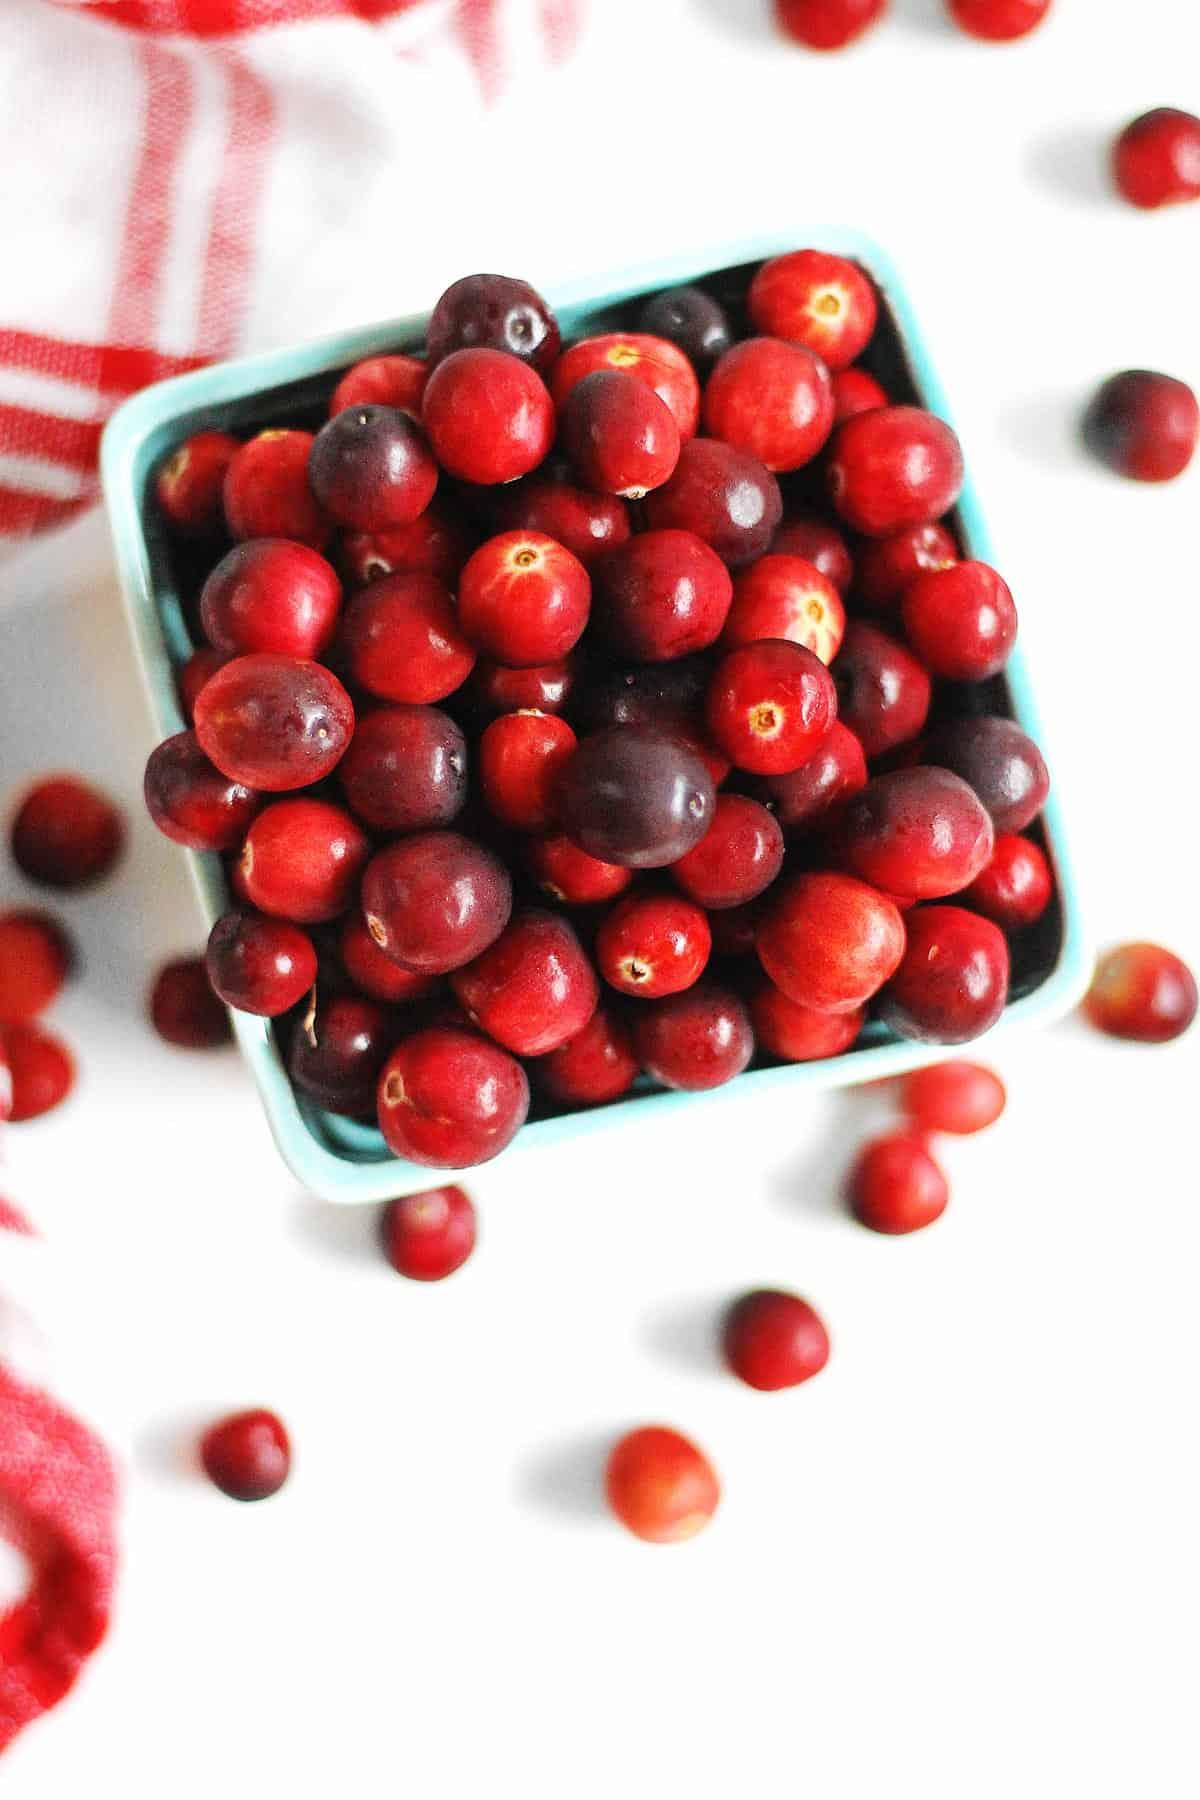 cranberries in a farmers market basket